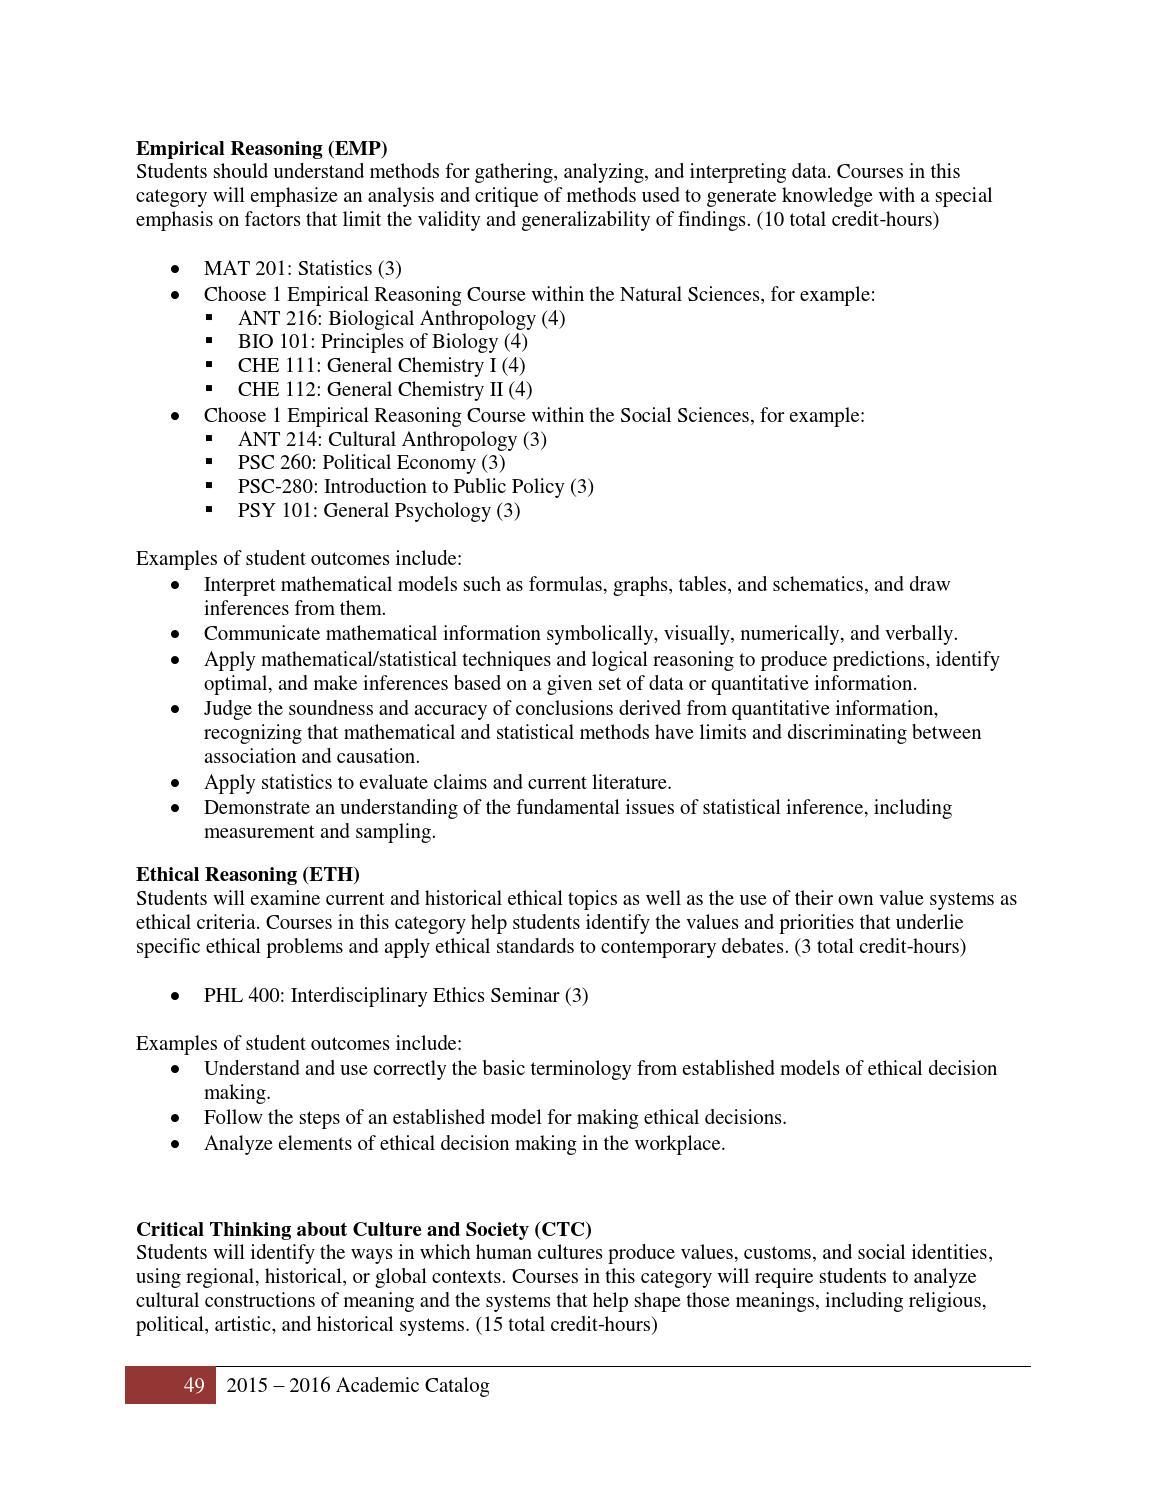 SPS Academic Catalog 2015-2016 by William Peace University - issuu